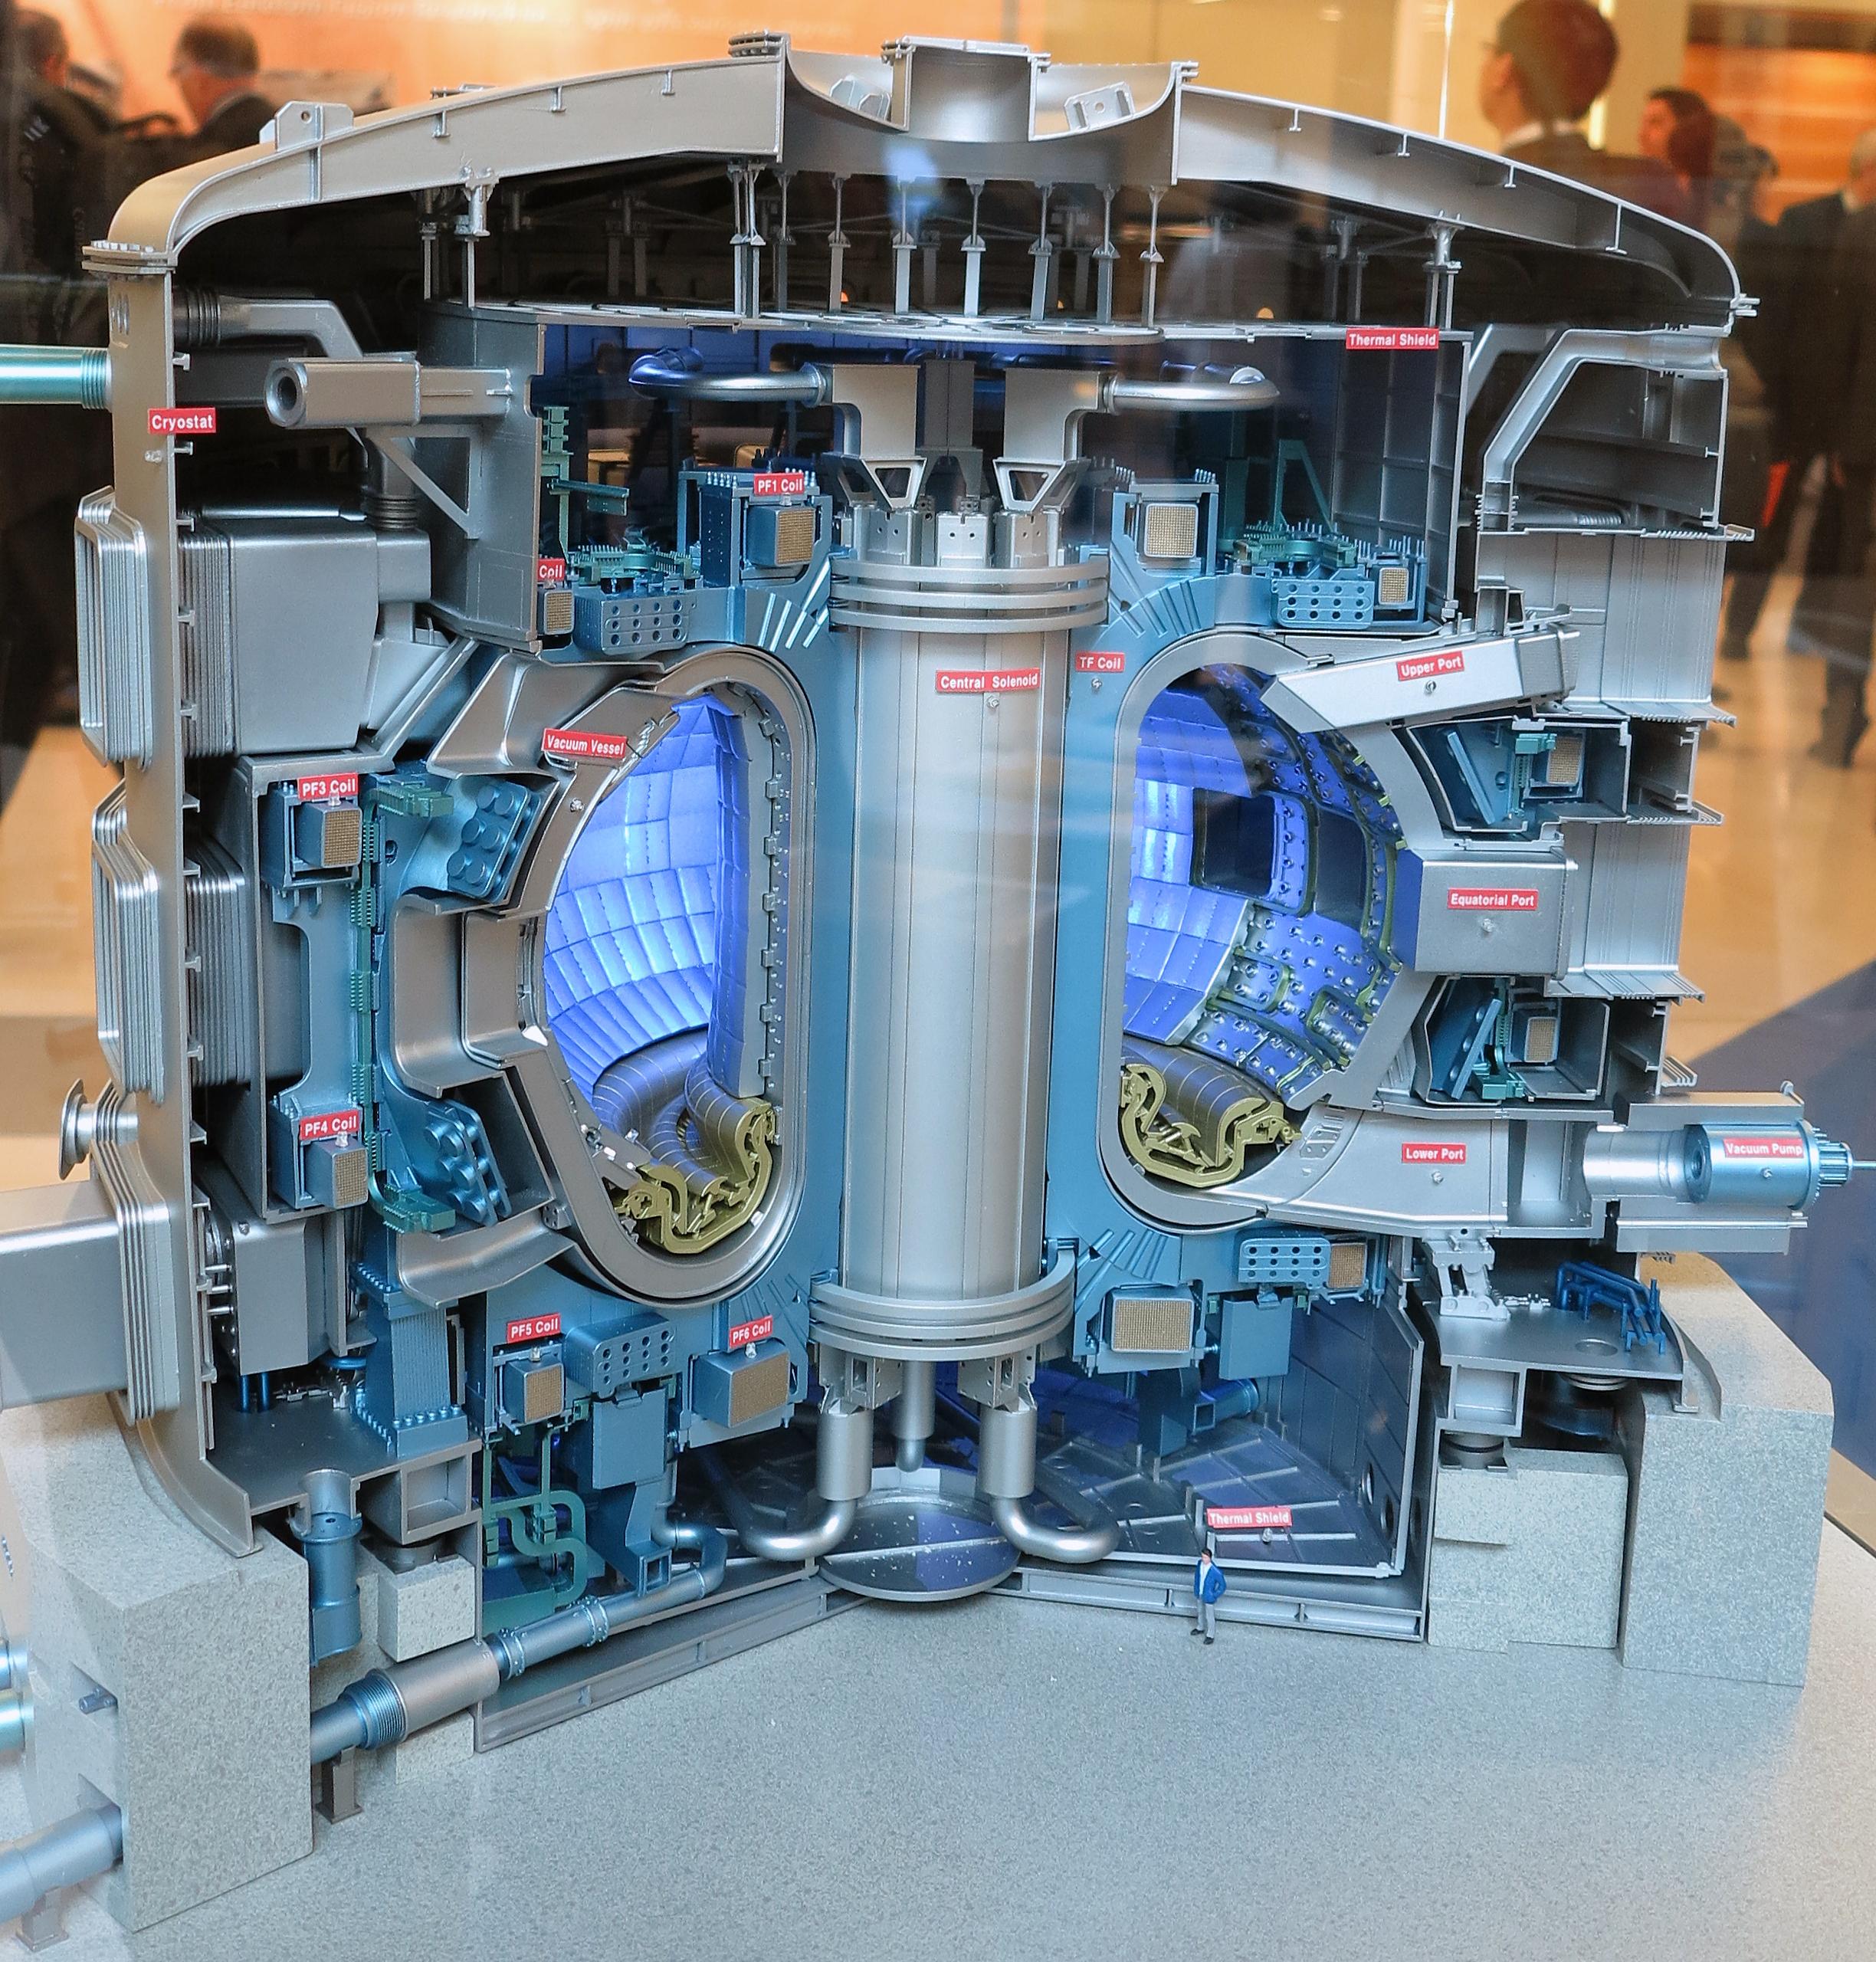 AICF讲座通知 核聚变系列讲座(一):ITER计划的历史,最新进展和展望